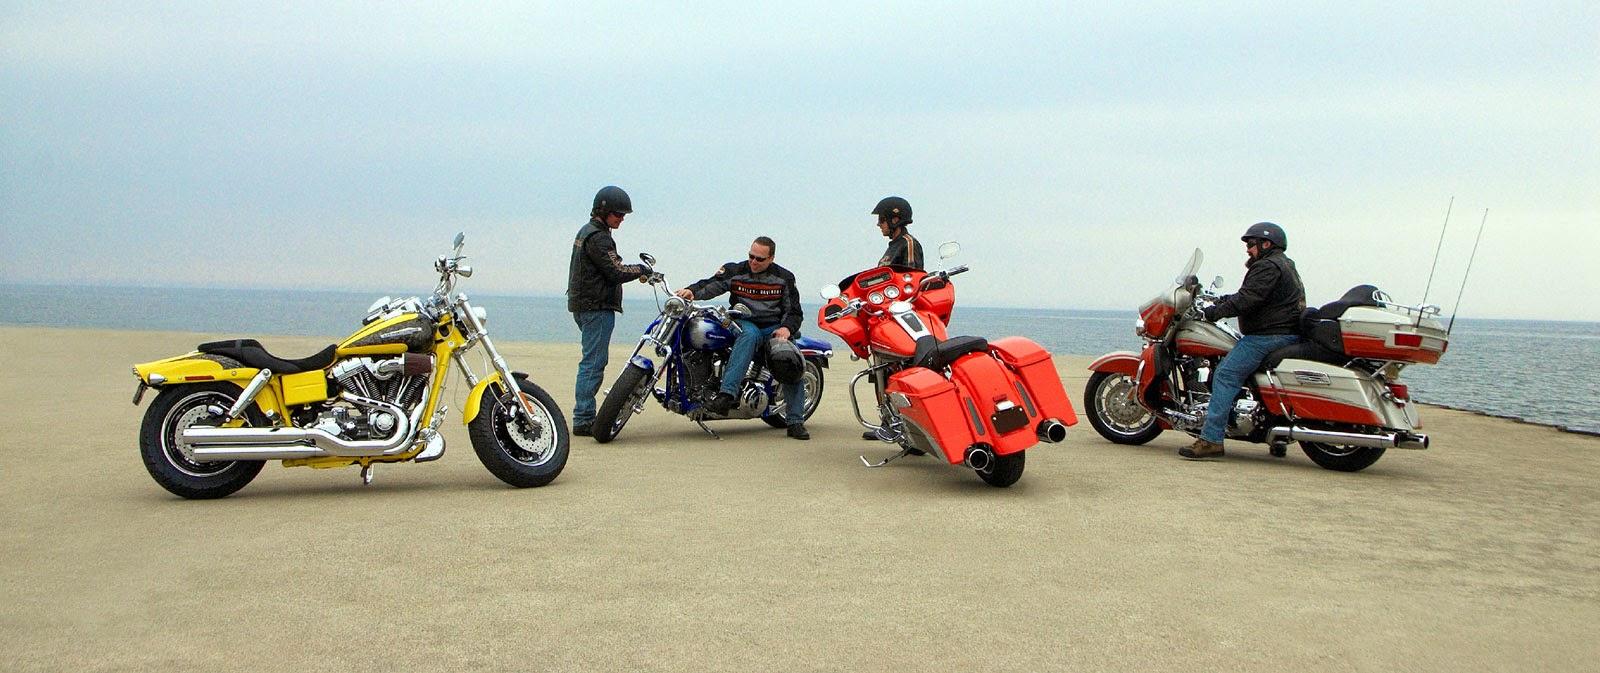 harley davidson cvo dyna fat bob fxdfse owner s manual 2009 rh harley manuals cc 2009 Ultra Classic Issues 2009 Harley CVO